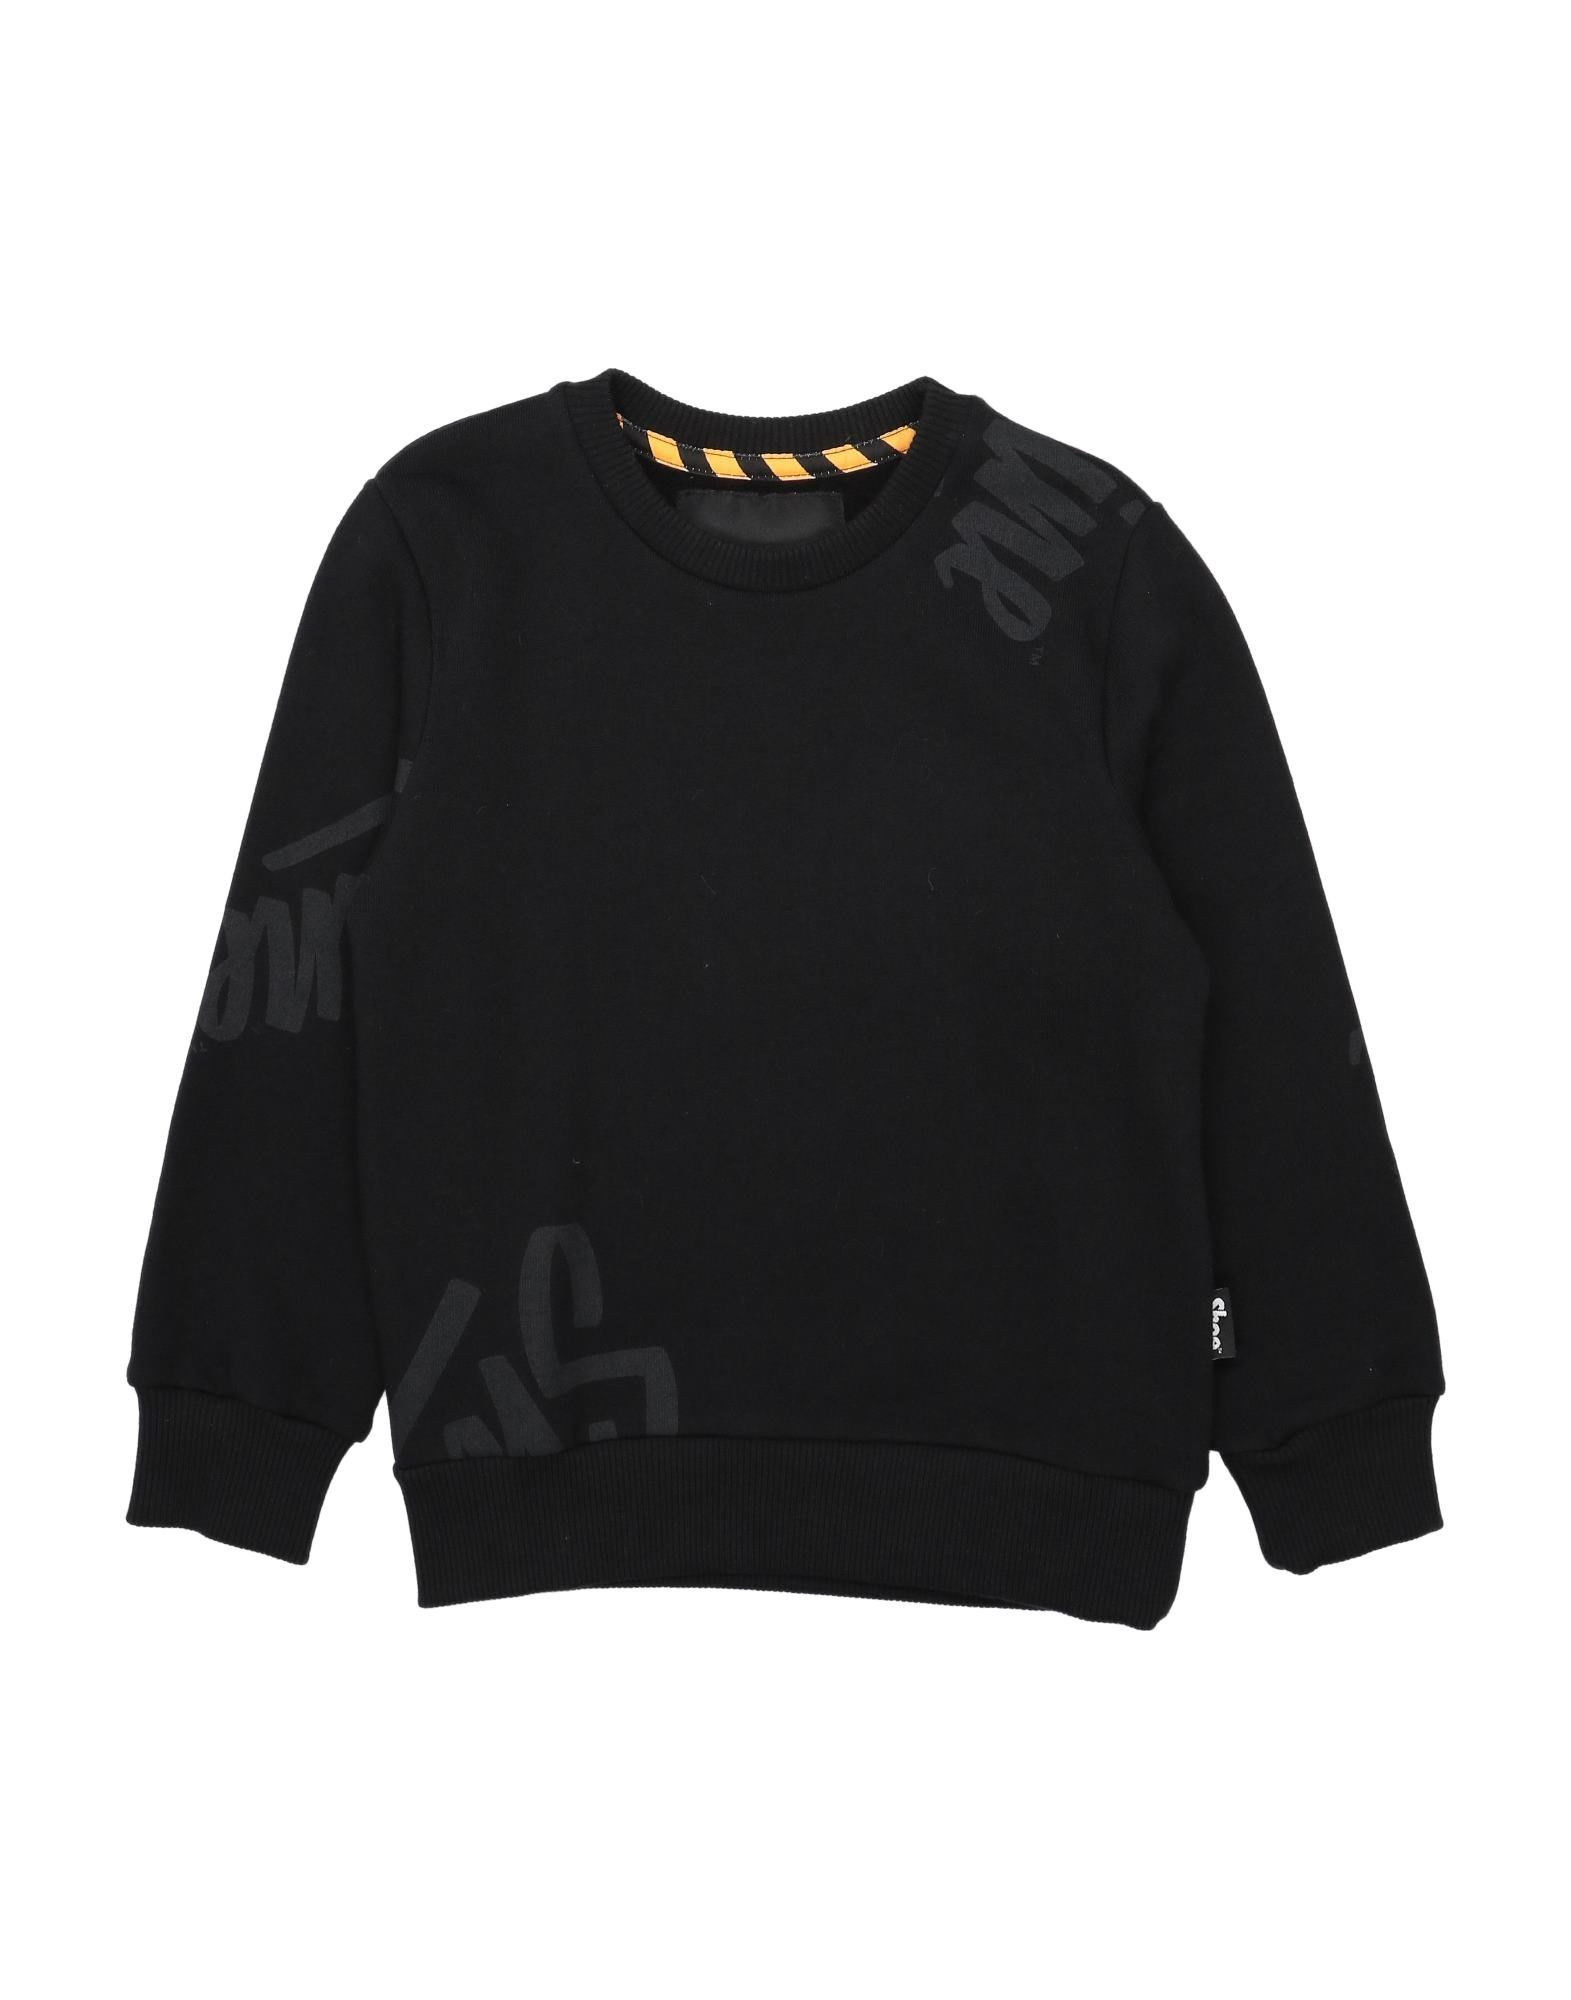 Shoeshine Kids' Sweatshirts In Black